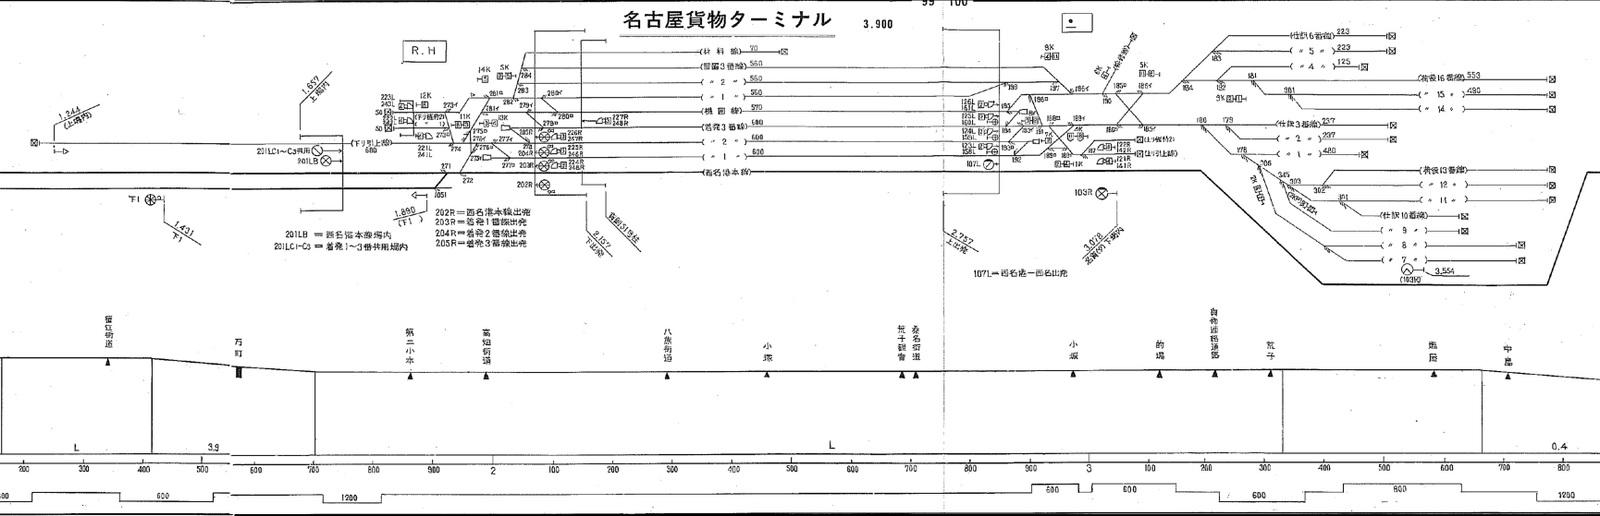 199008